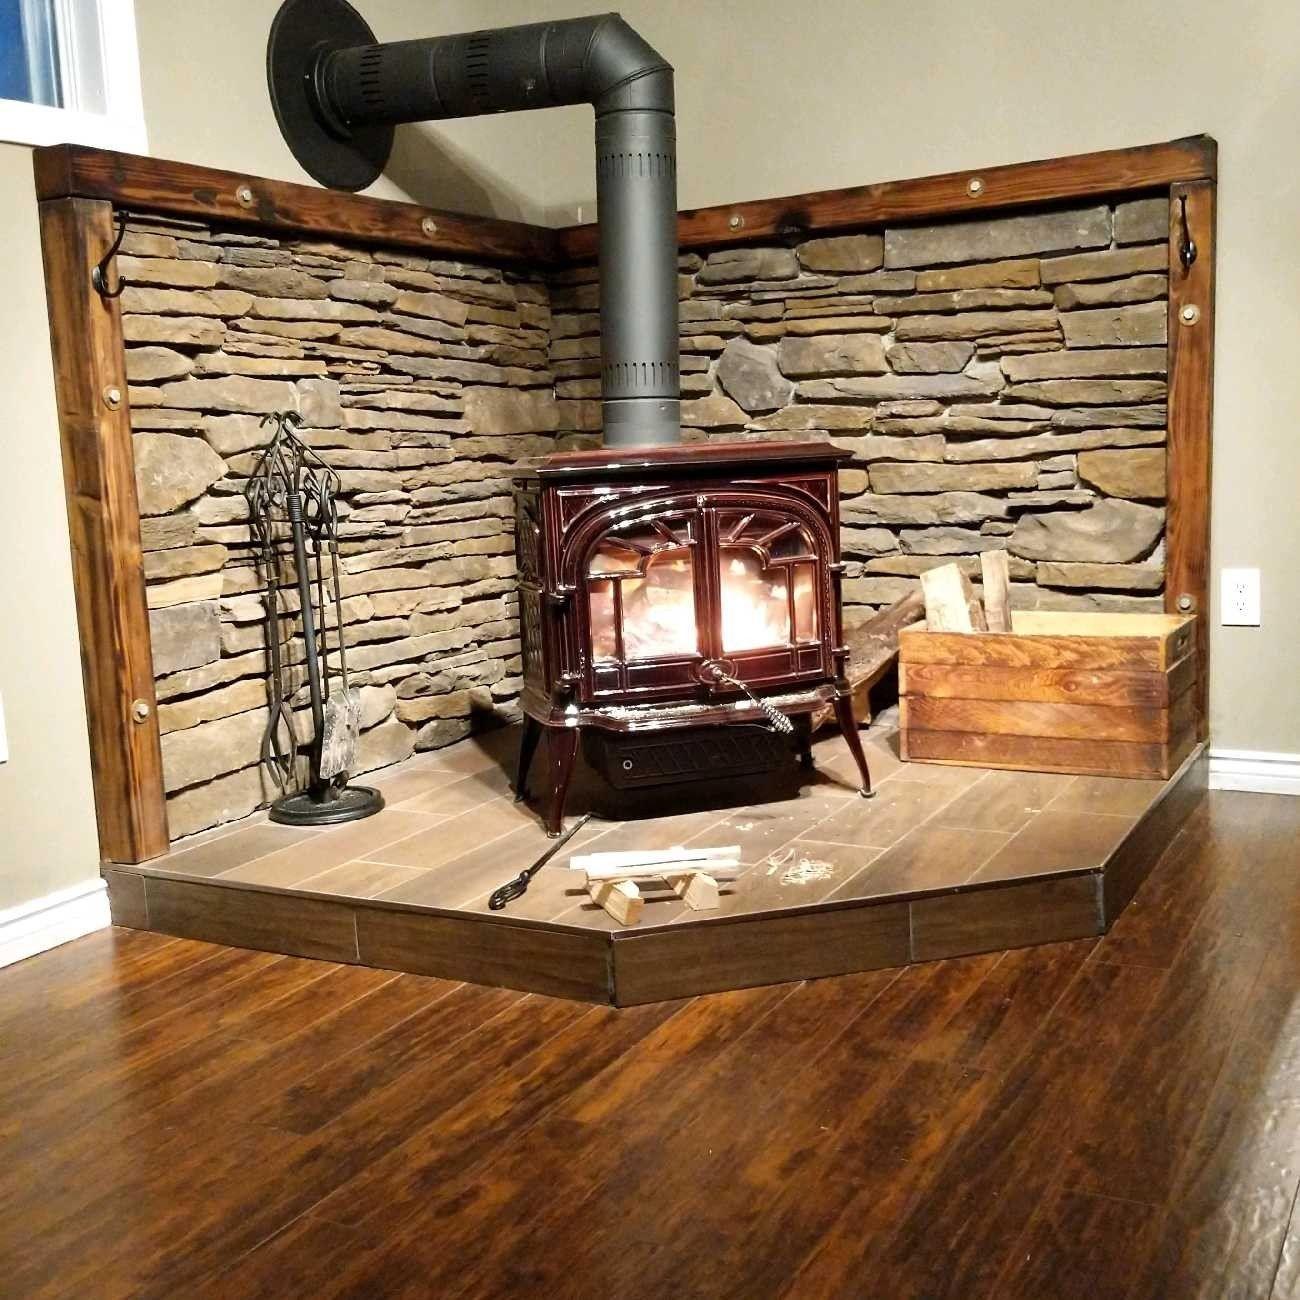 Freestandingfireplacewoodburningfireplaces Wood Stove Hearth Corner Wood Stove Wood Stove Surround